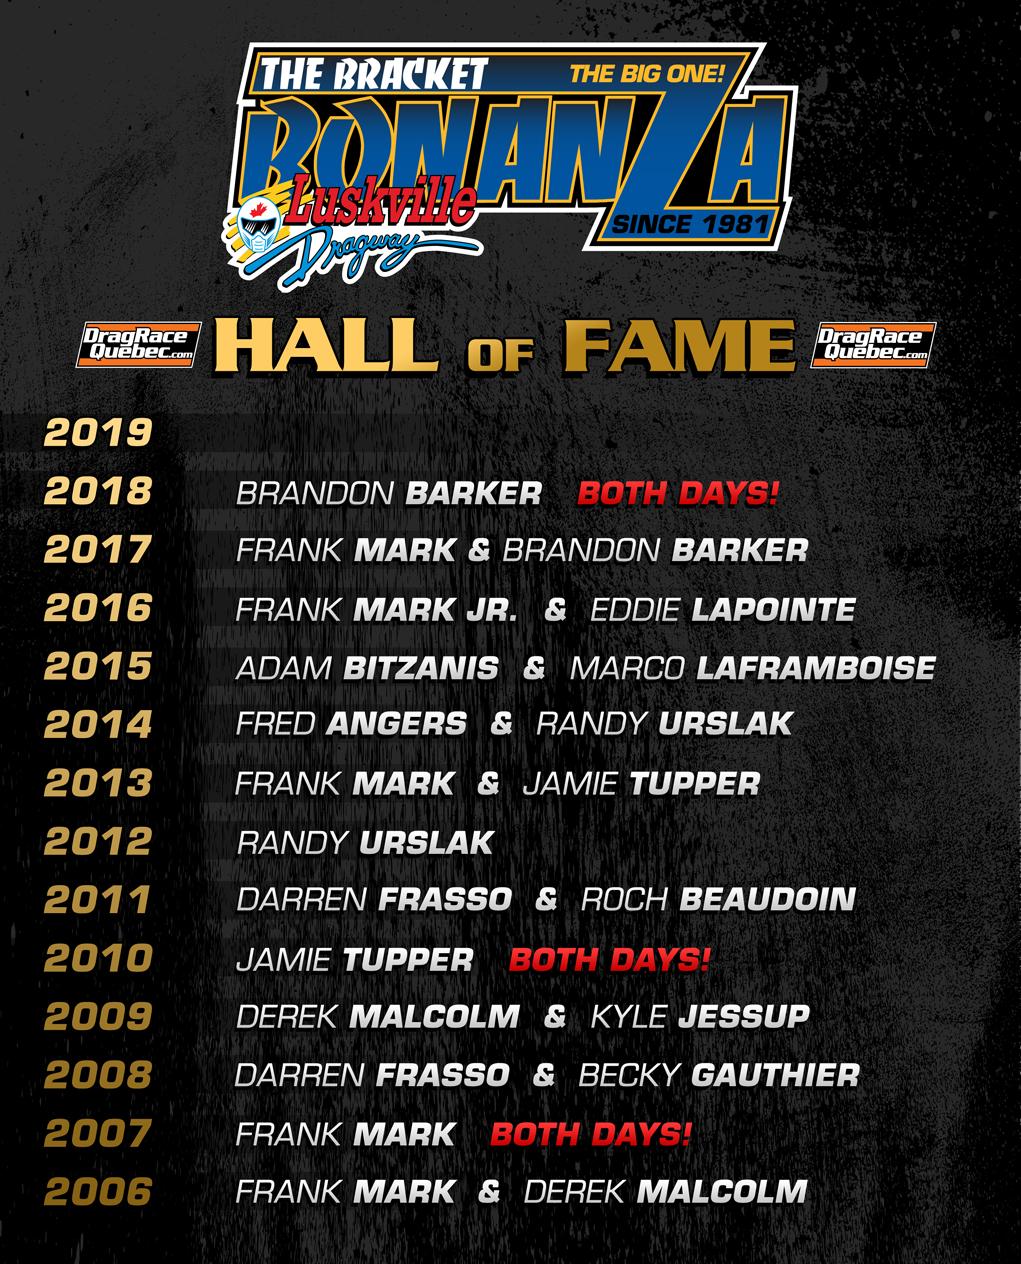 bonanza-hall-of-fame